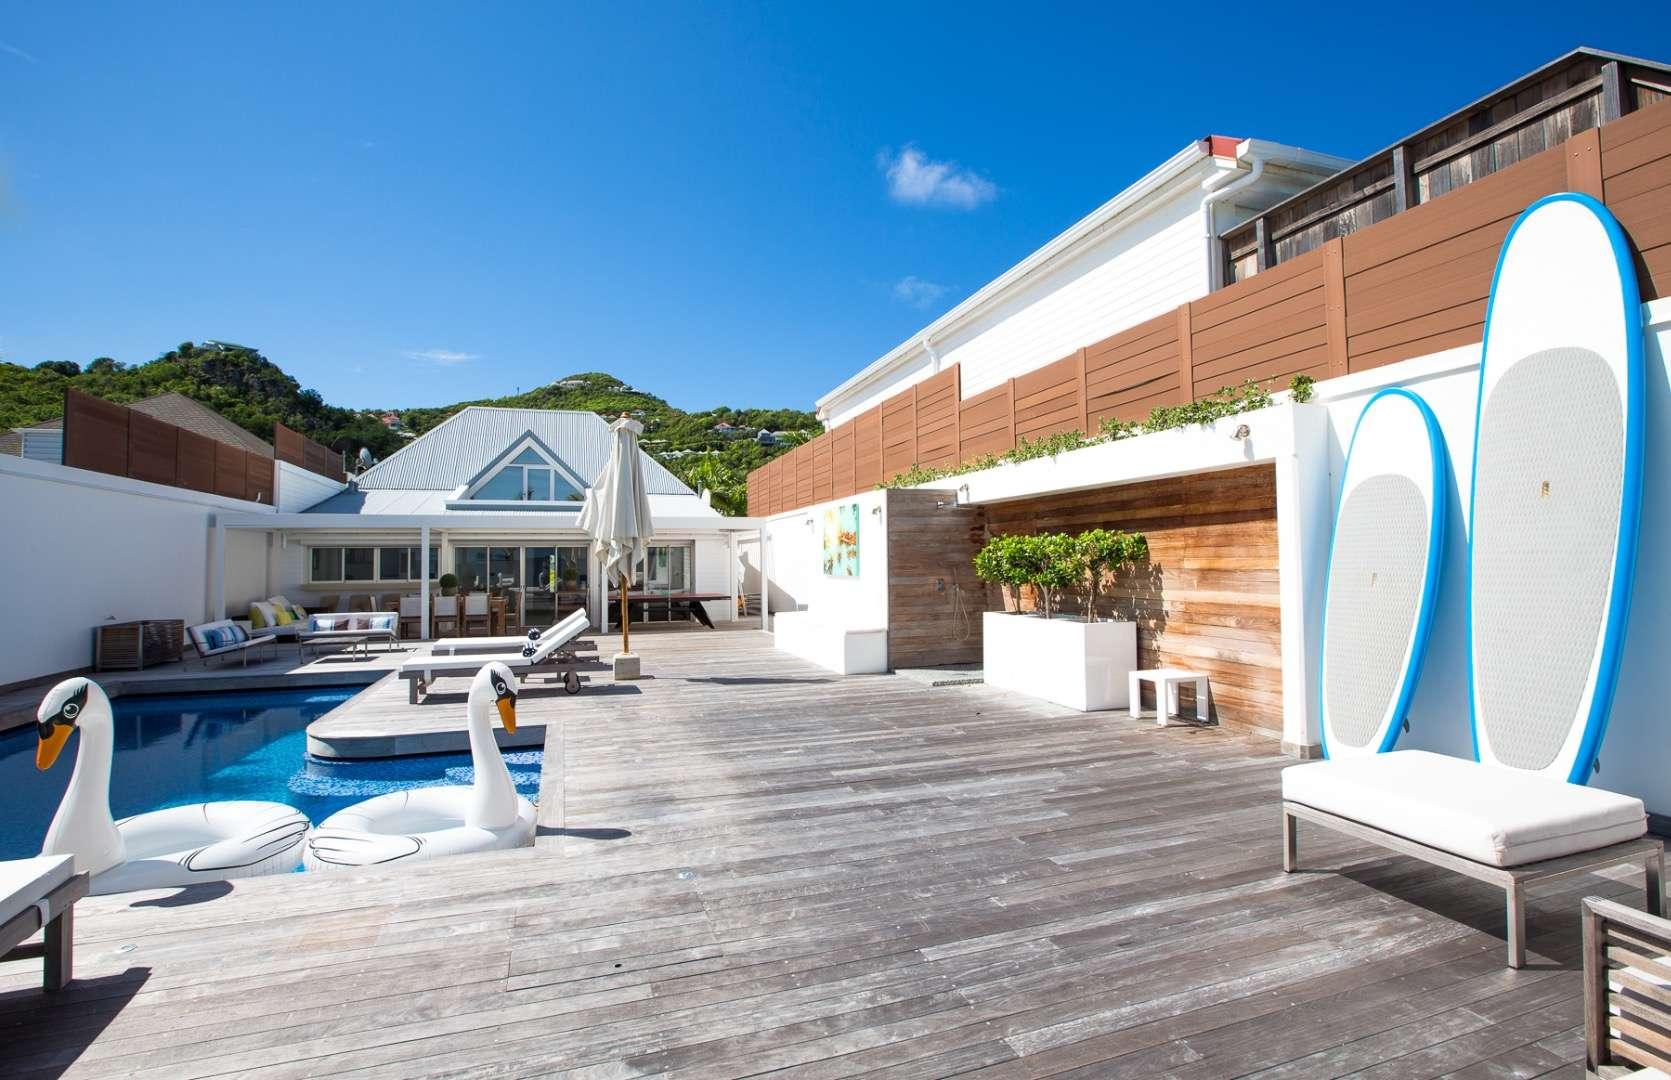 Luxury villa rentals caribbean - St barthelemy - Flamands - Ganesha - Image 1/15